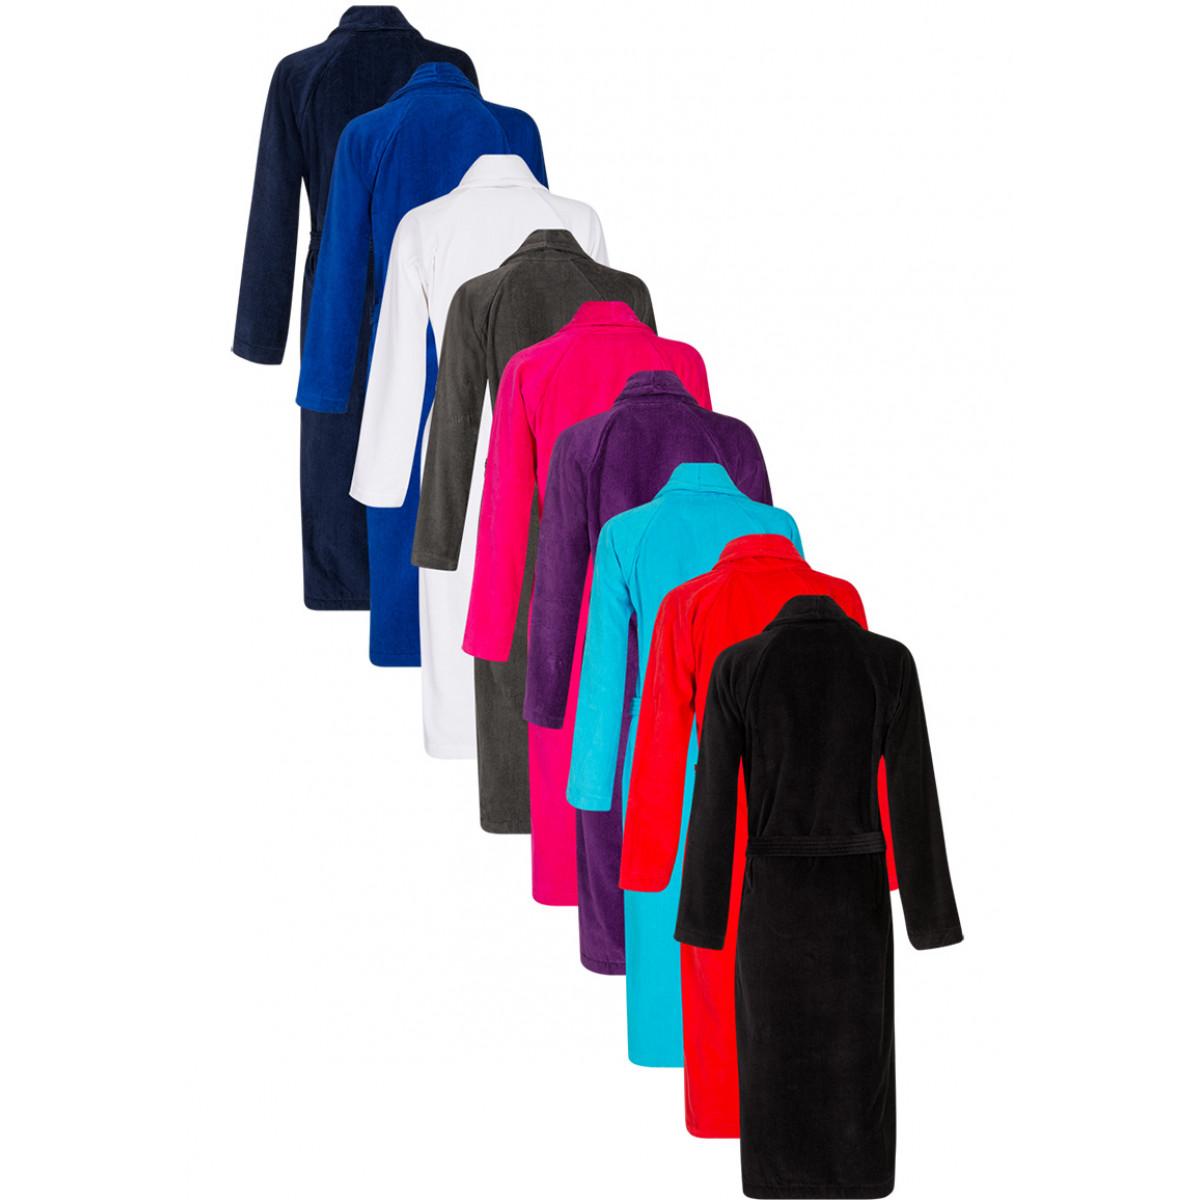 Badjassen velours katoen in 9 frisse kleuren